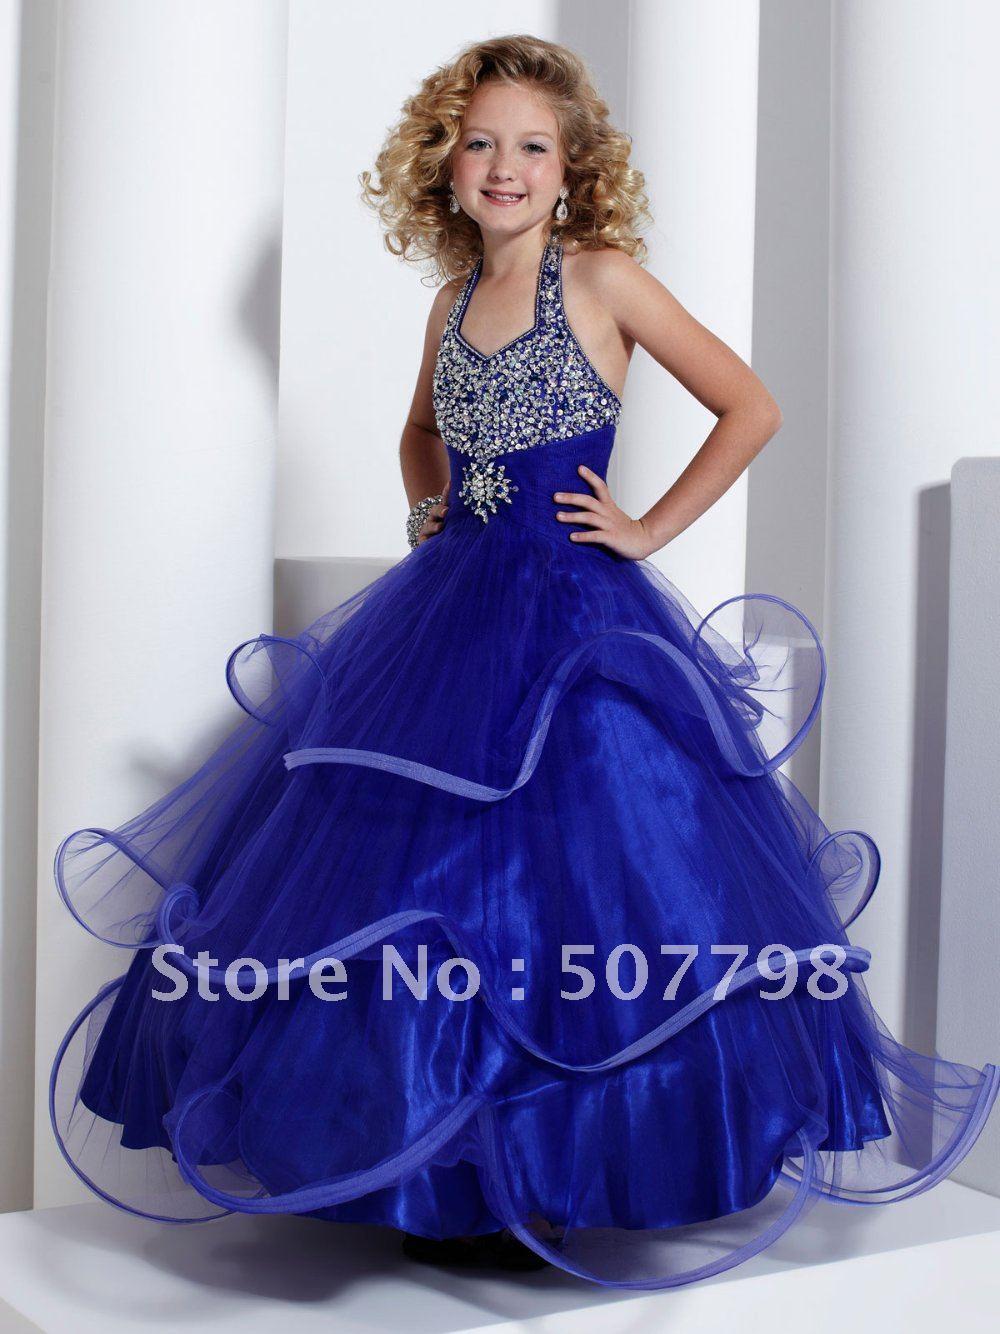 Aliexpress com Buy Tiffany Princess Girl Dress Blue halter